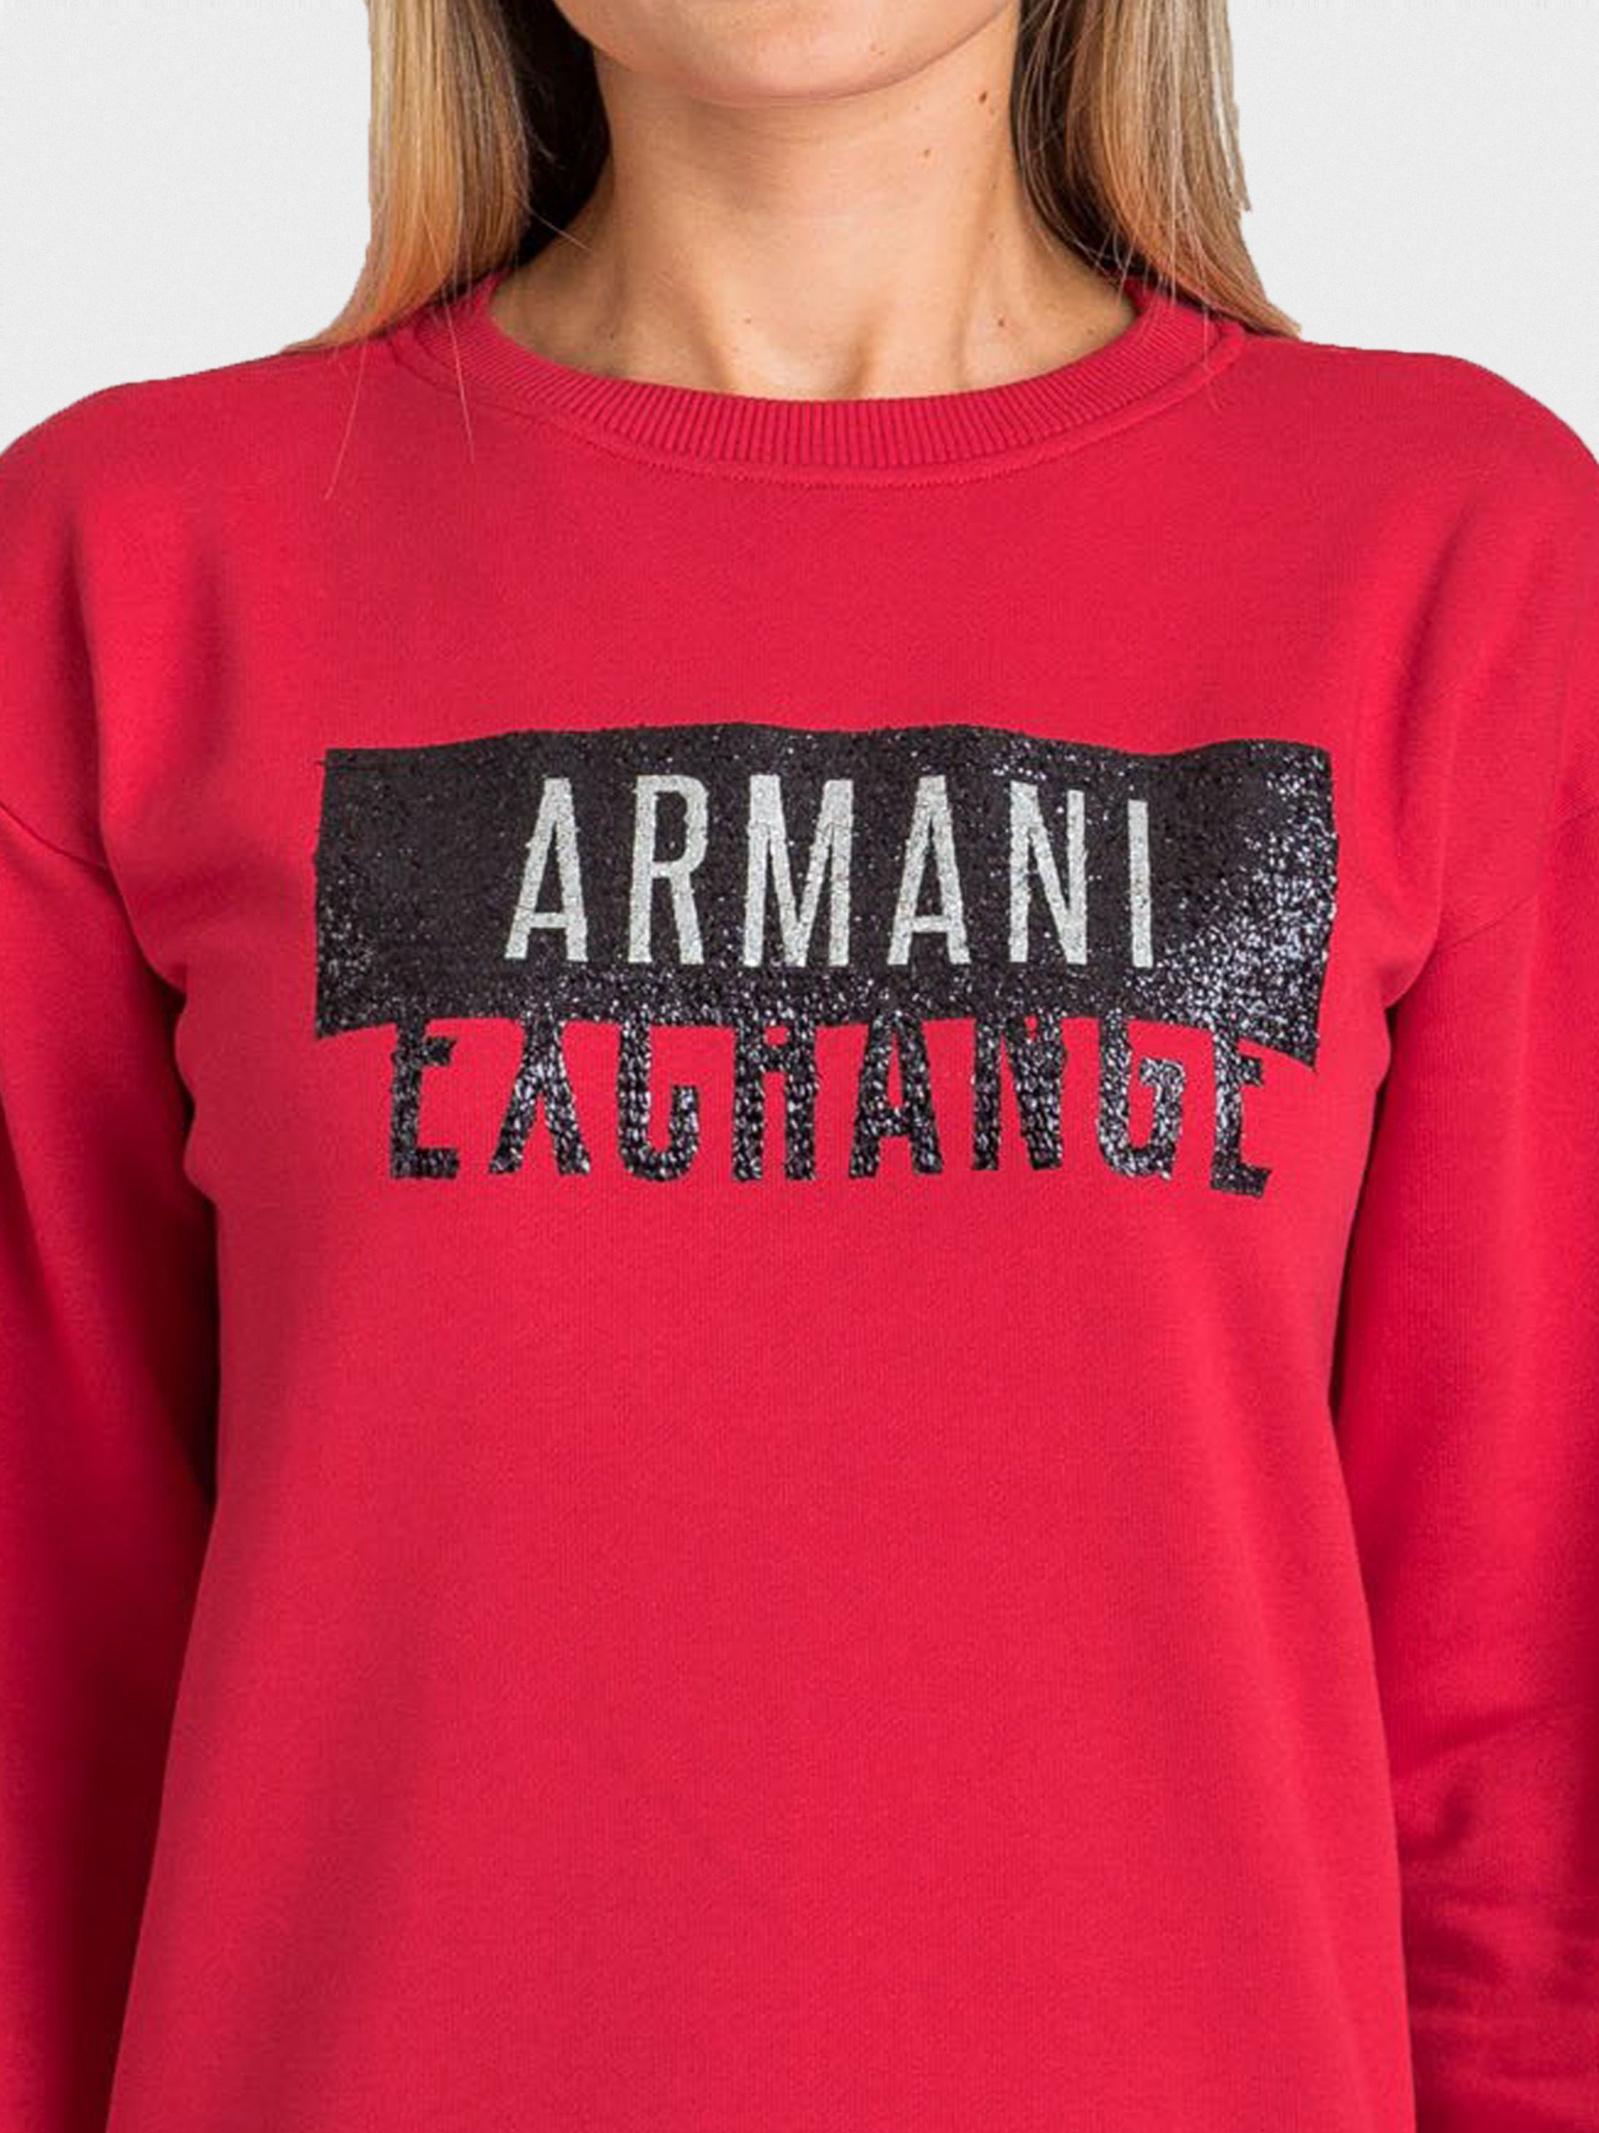 Платье женские Armani Exchange модель QZ2045 , 2017